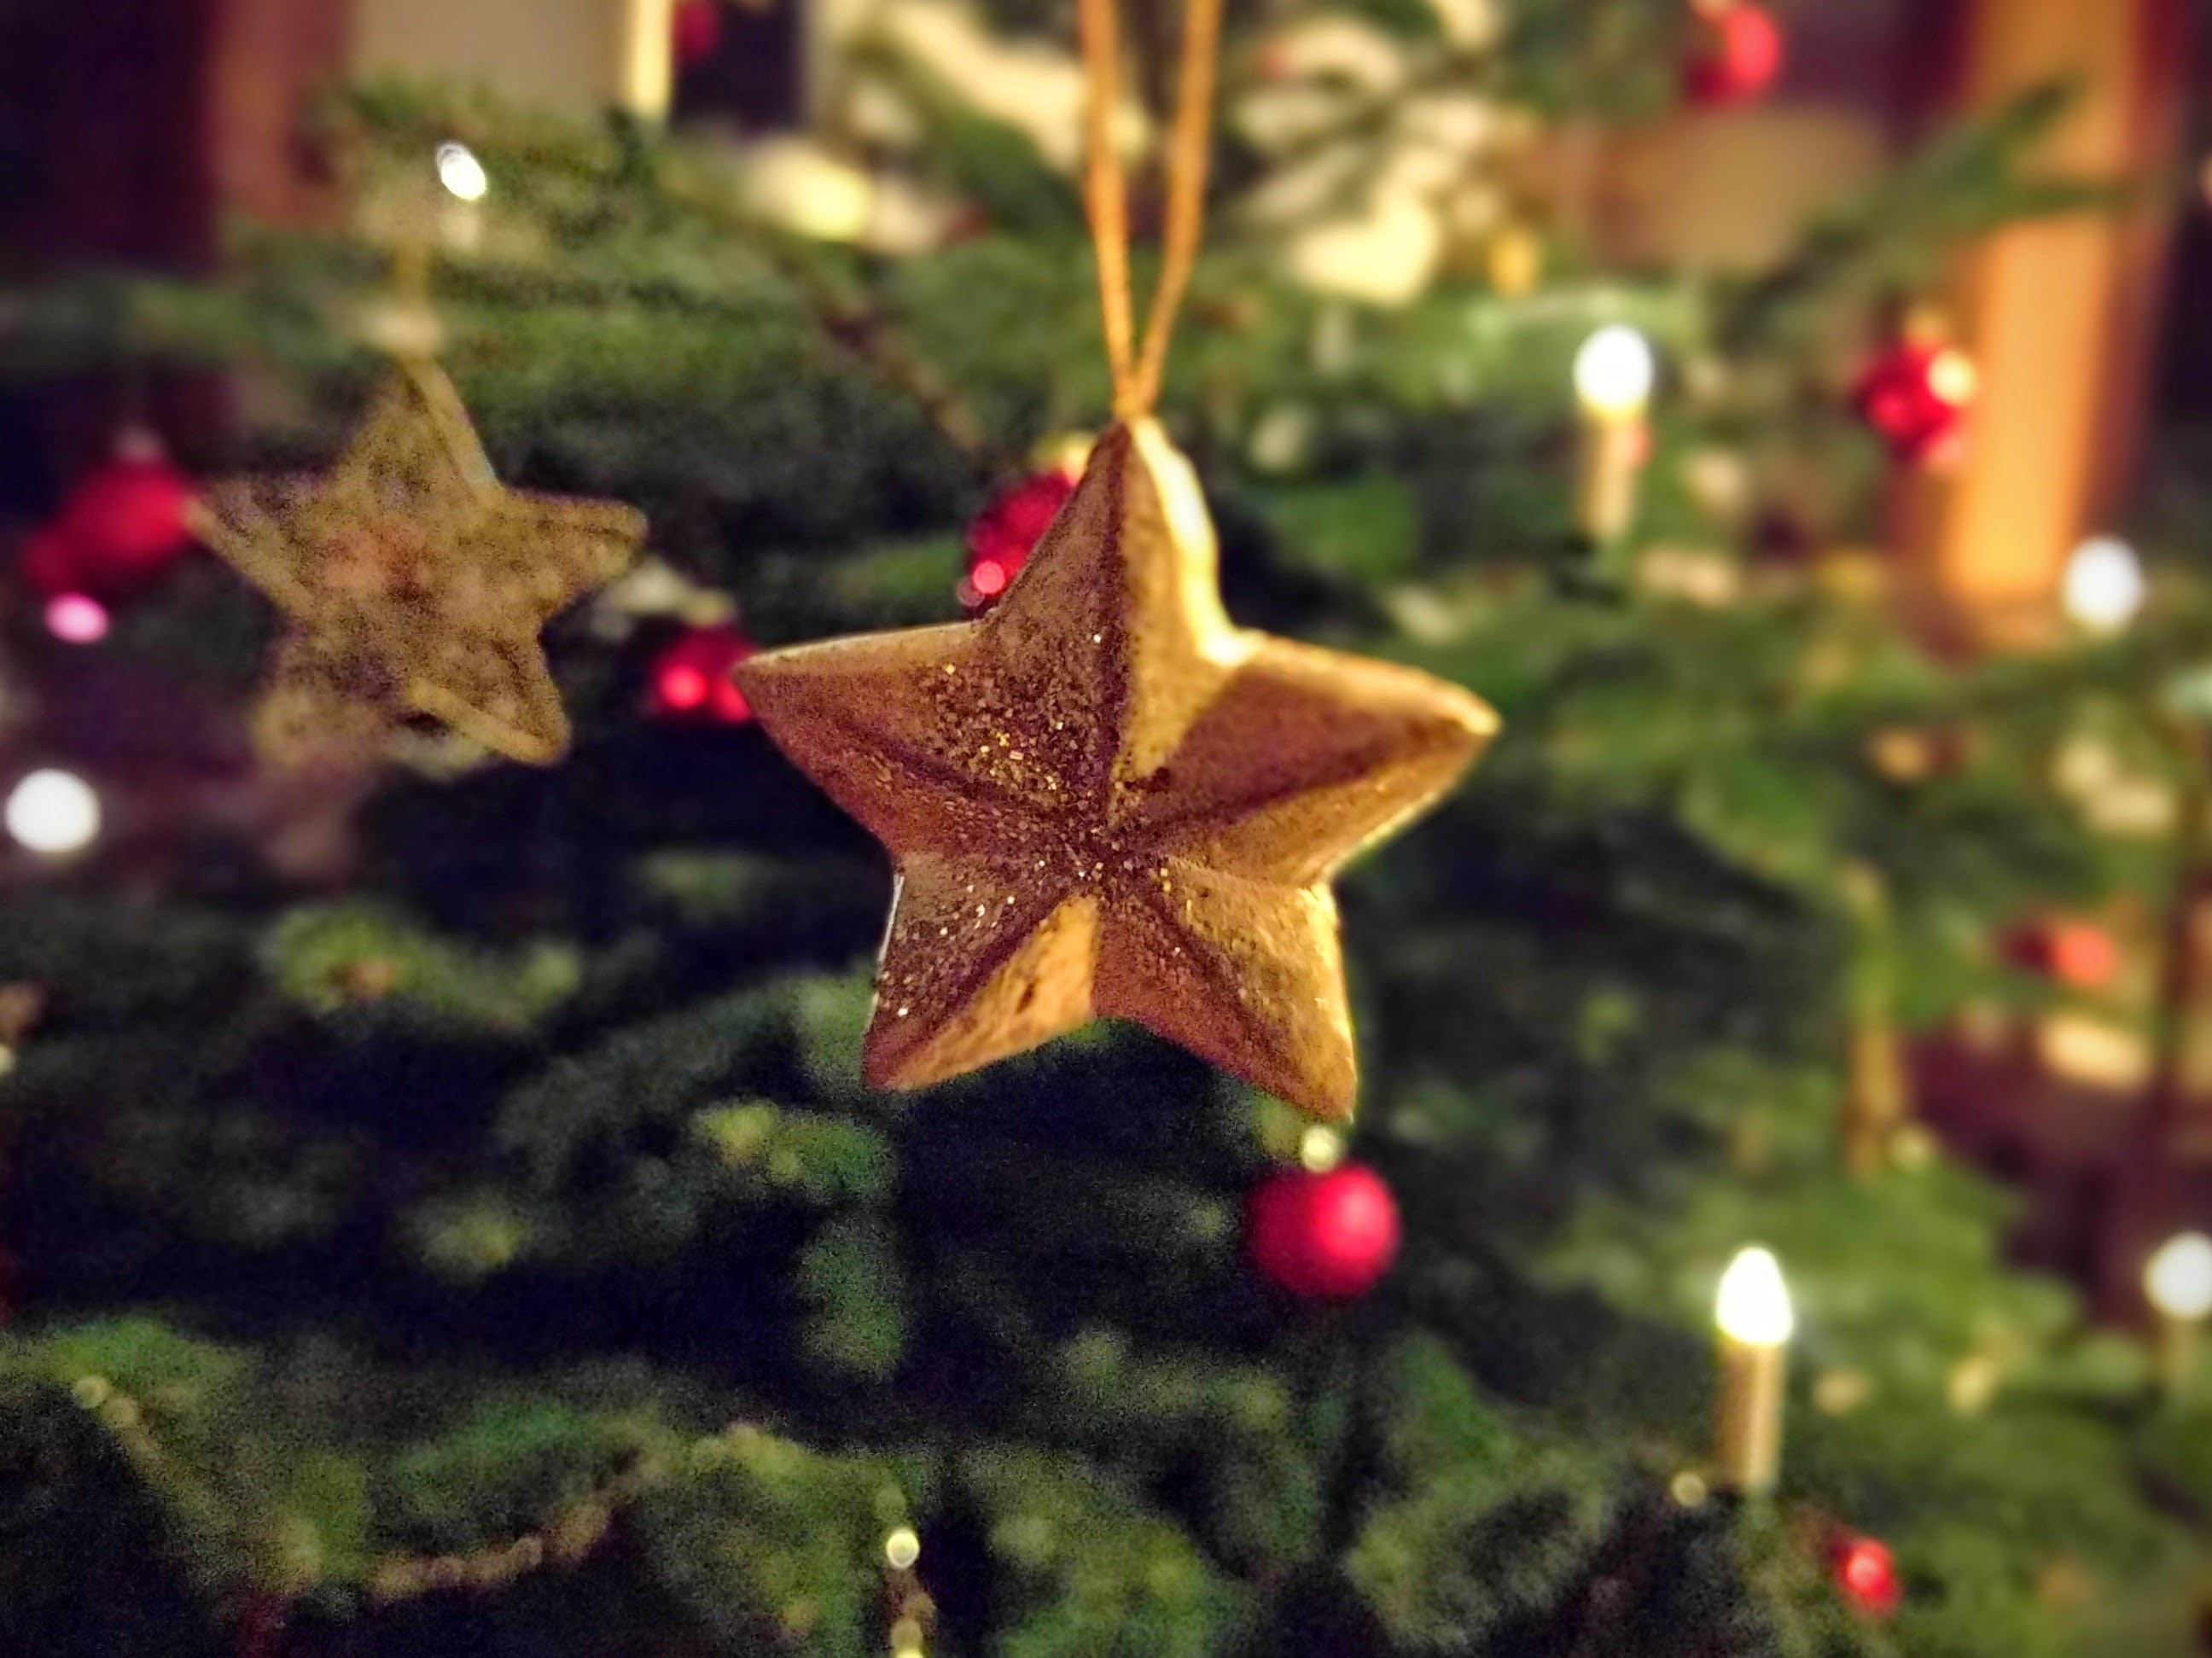 1000 Amazing Christmas Star Photos 183 Pexels 183 Free Stock